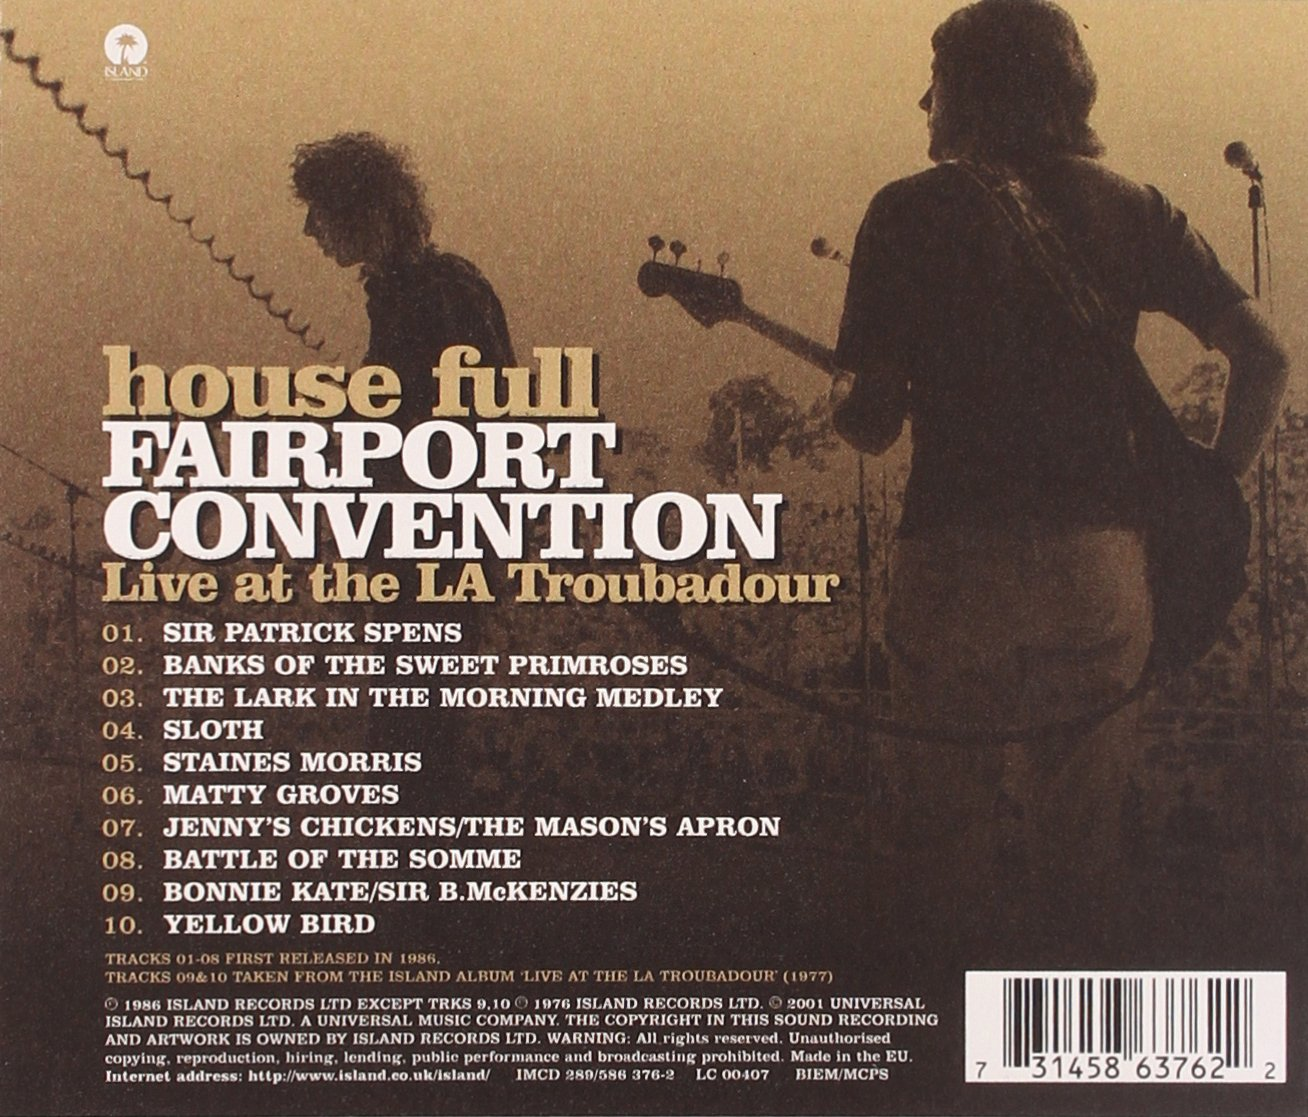 House Full: Fairport Convention Live at the LA Troubadour